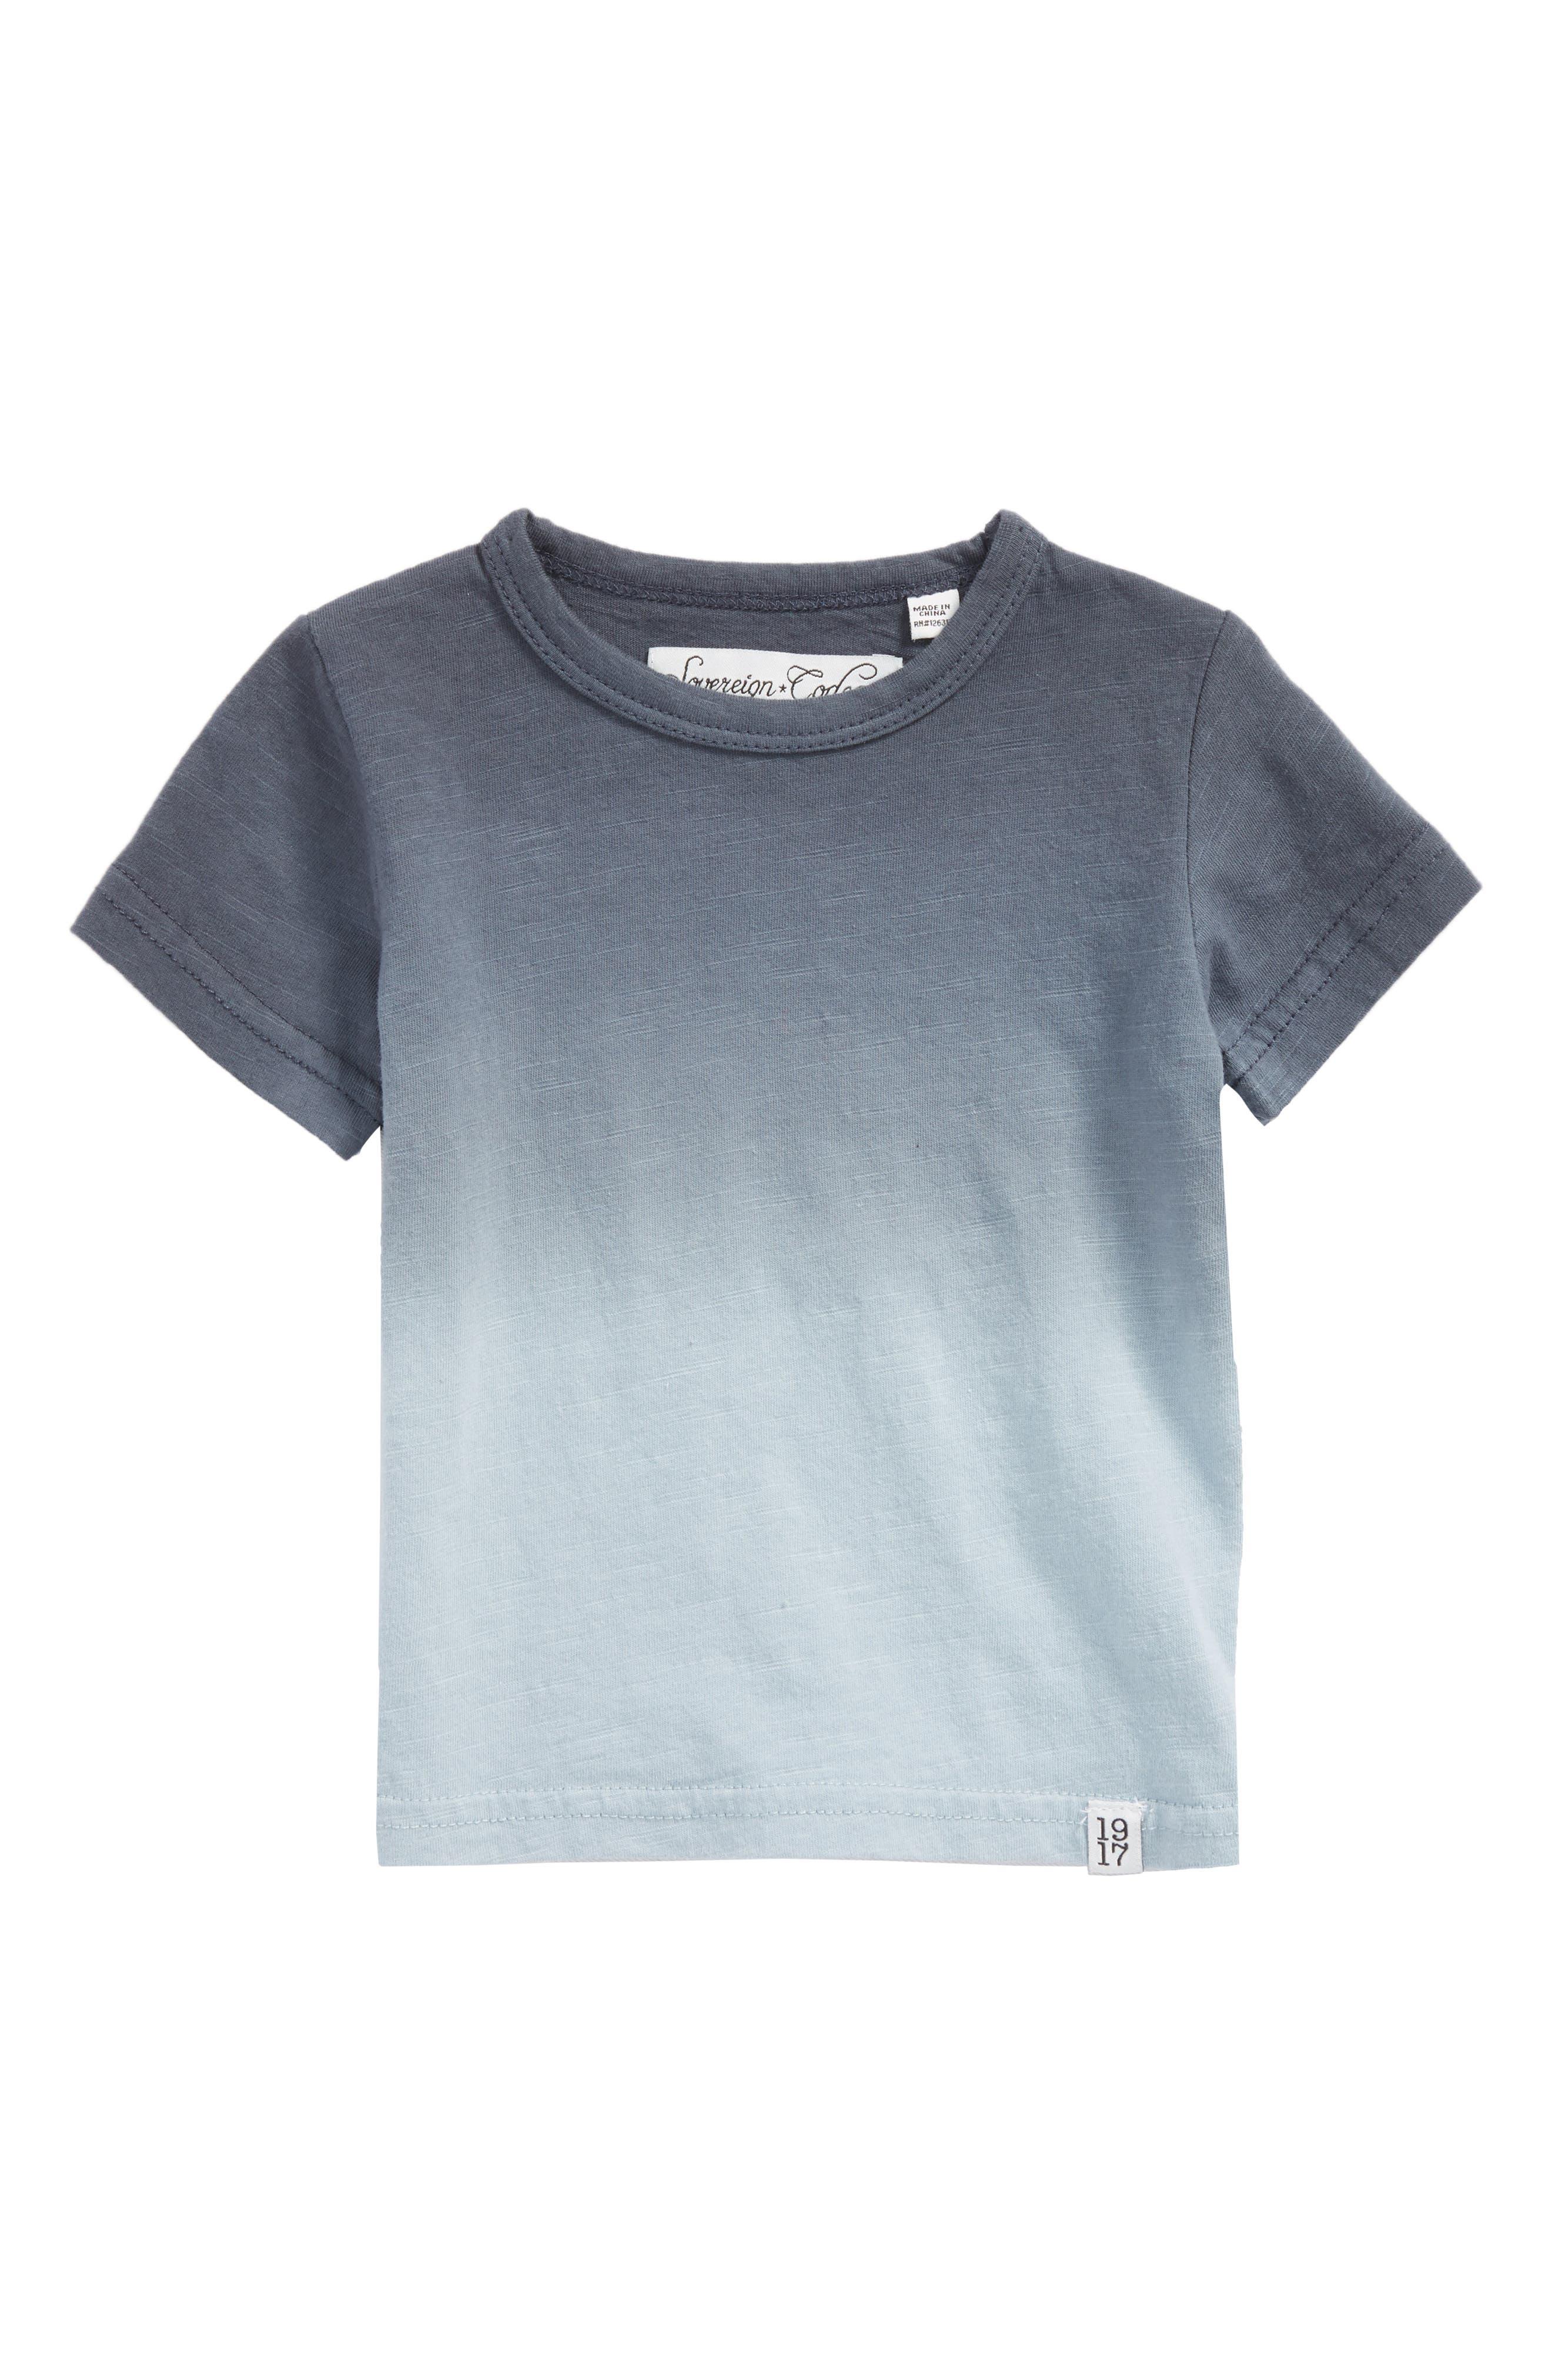 Faxon T-Shirt,                             Main thumbnail 1, color,